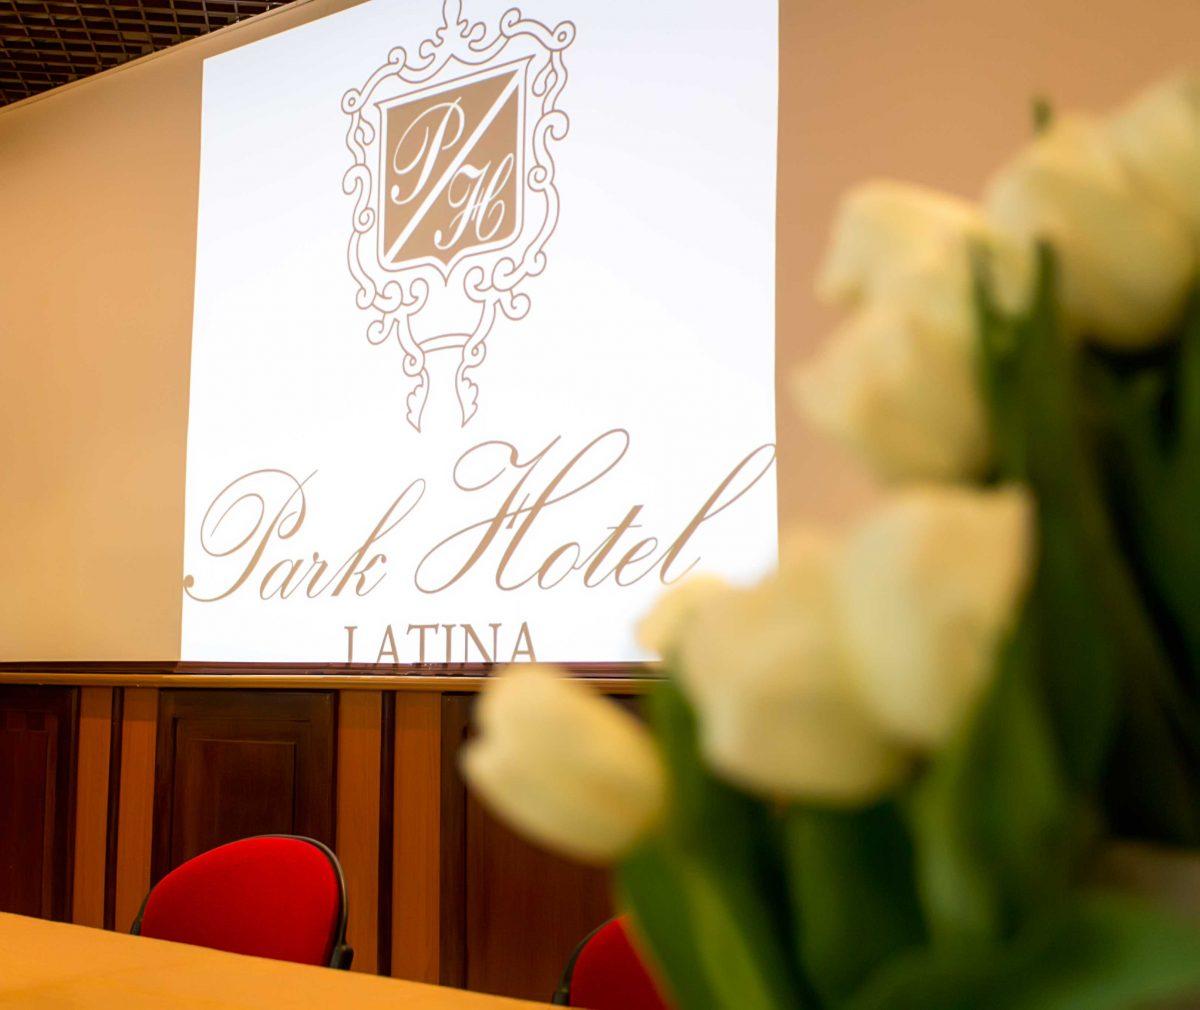 Sala Conferenze Park Hotel Latina